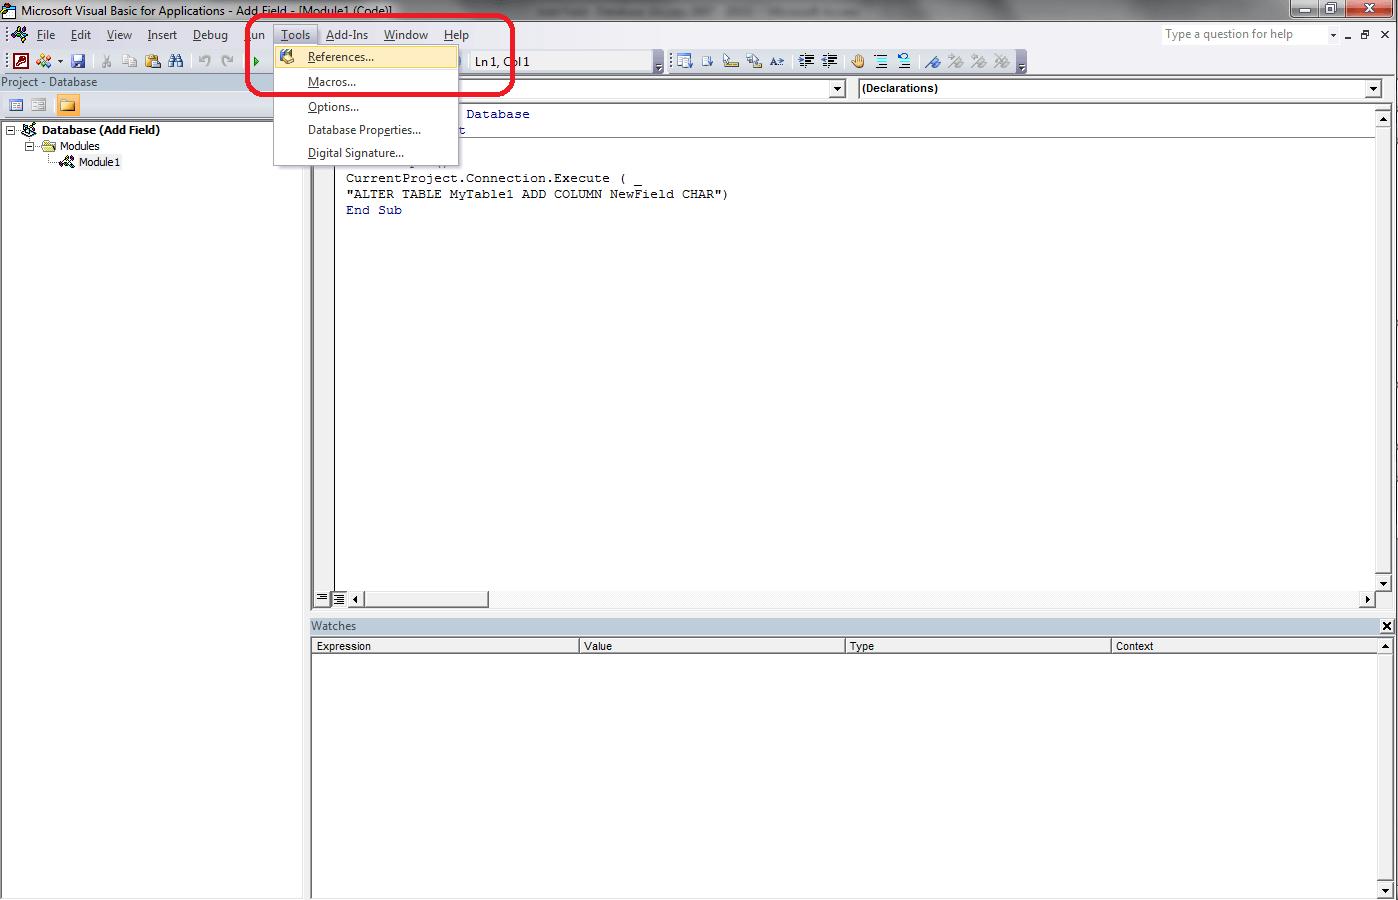 VBA Access Recordset, Object Library - VBA and VB Net